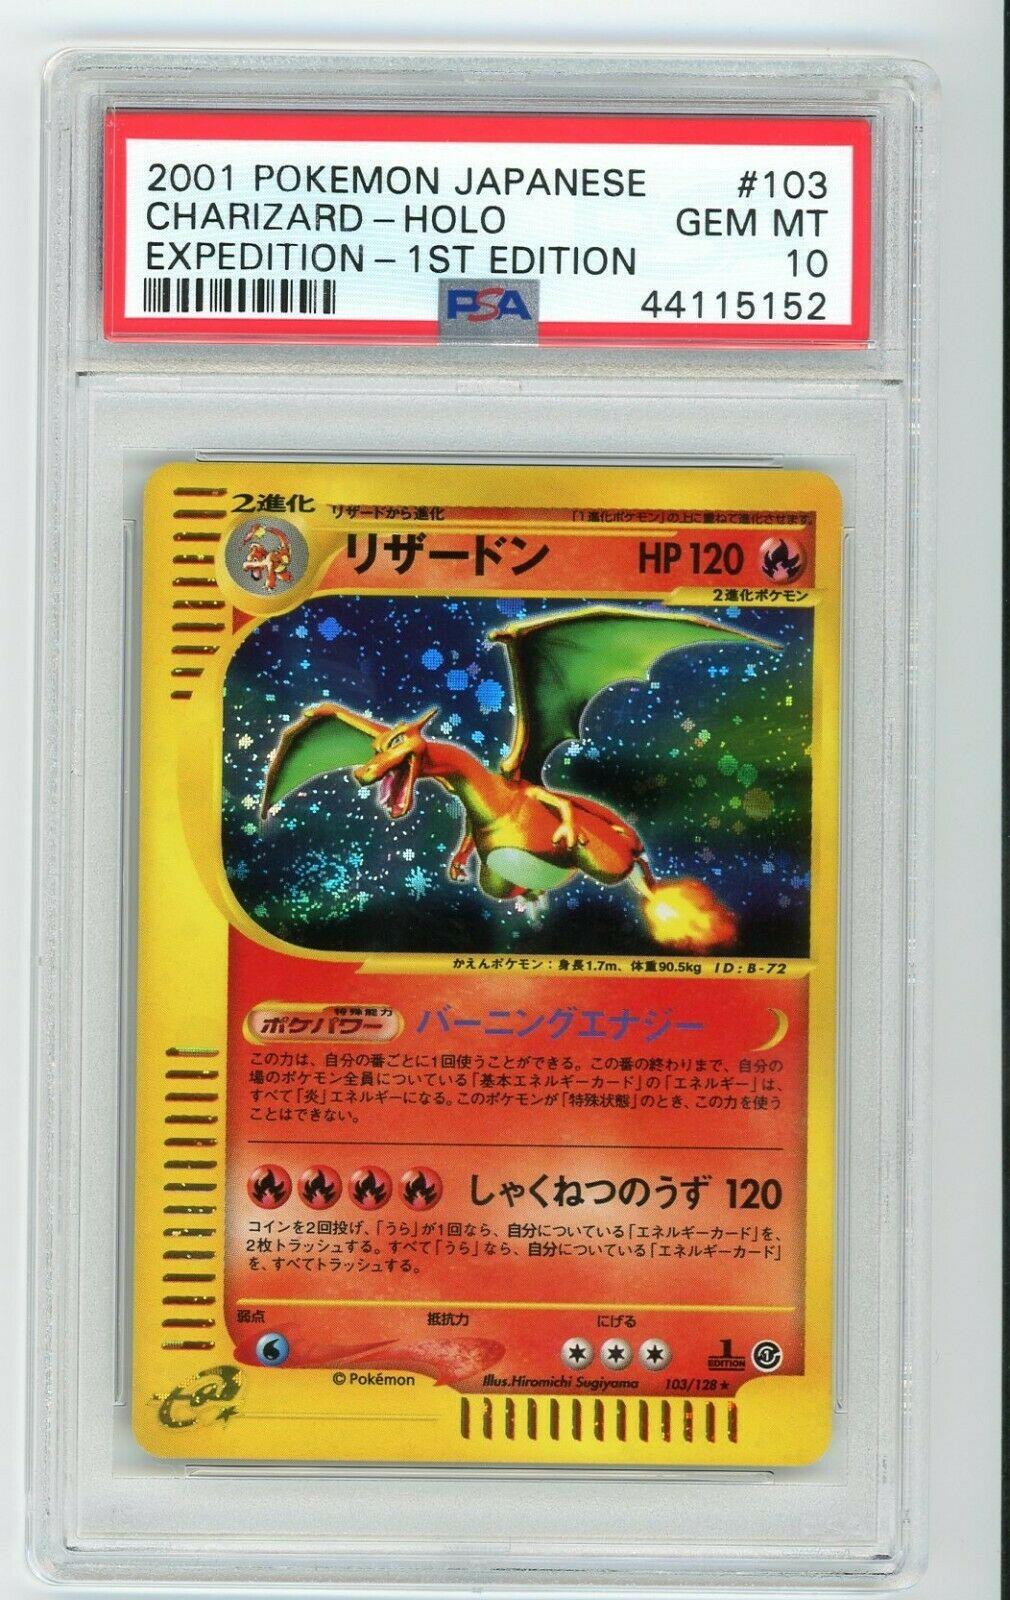 PSA 10 POKEMON JAPANESE CHARIZARD 103128 CARD 2001 1ST ED ESERIES EXPEDITION